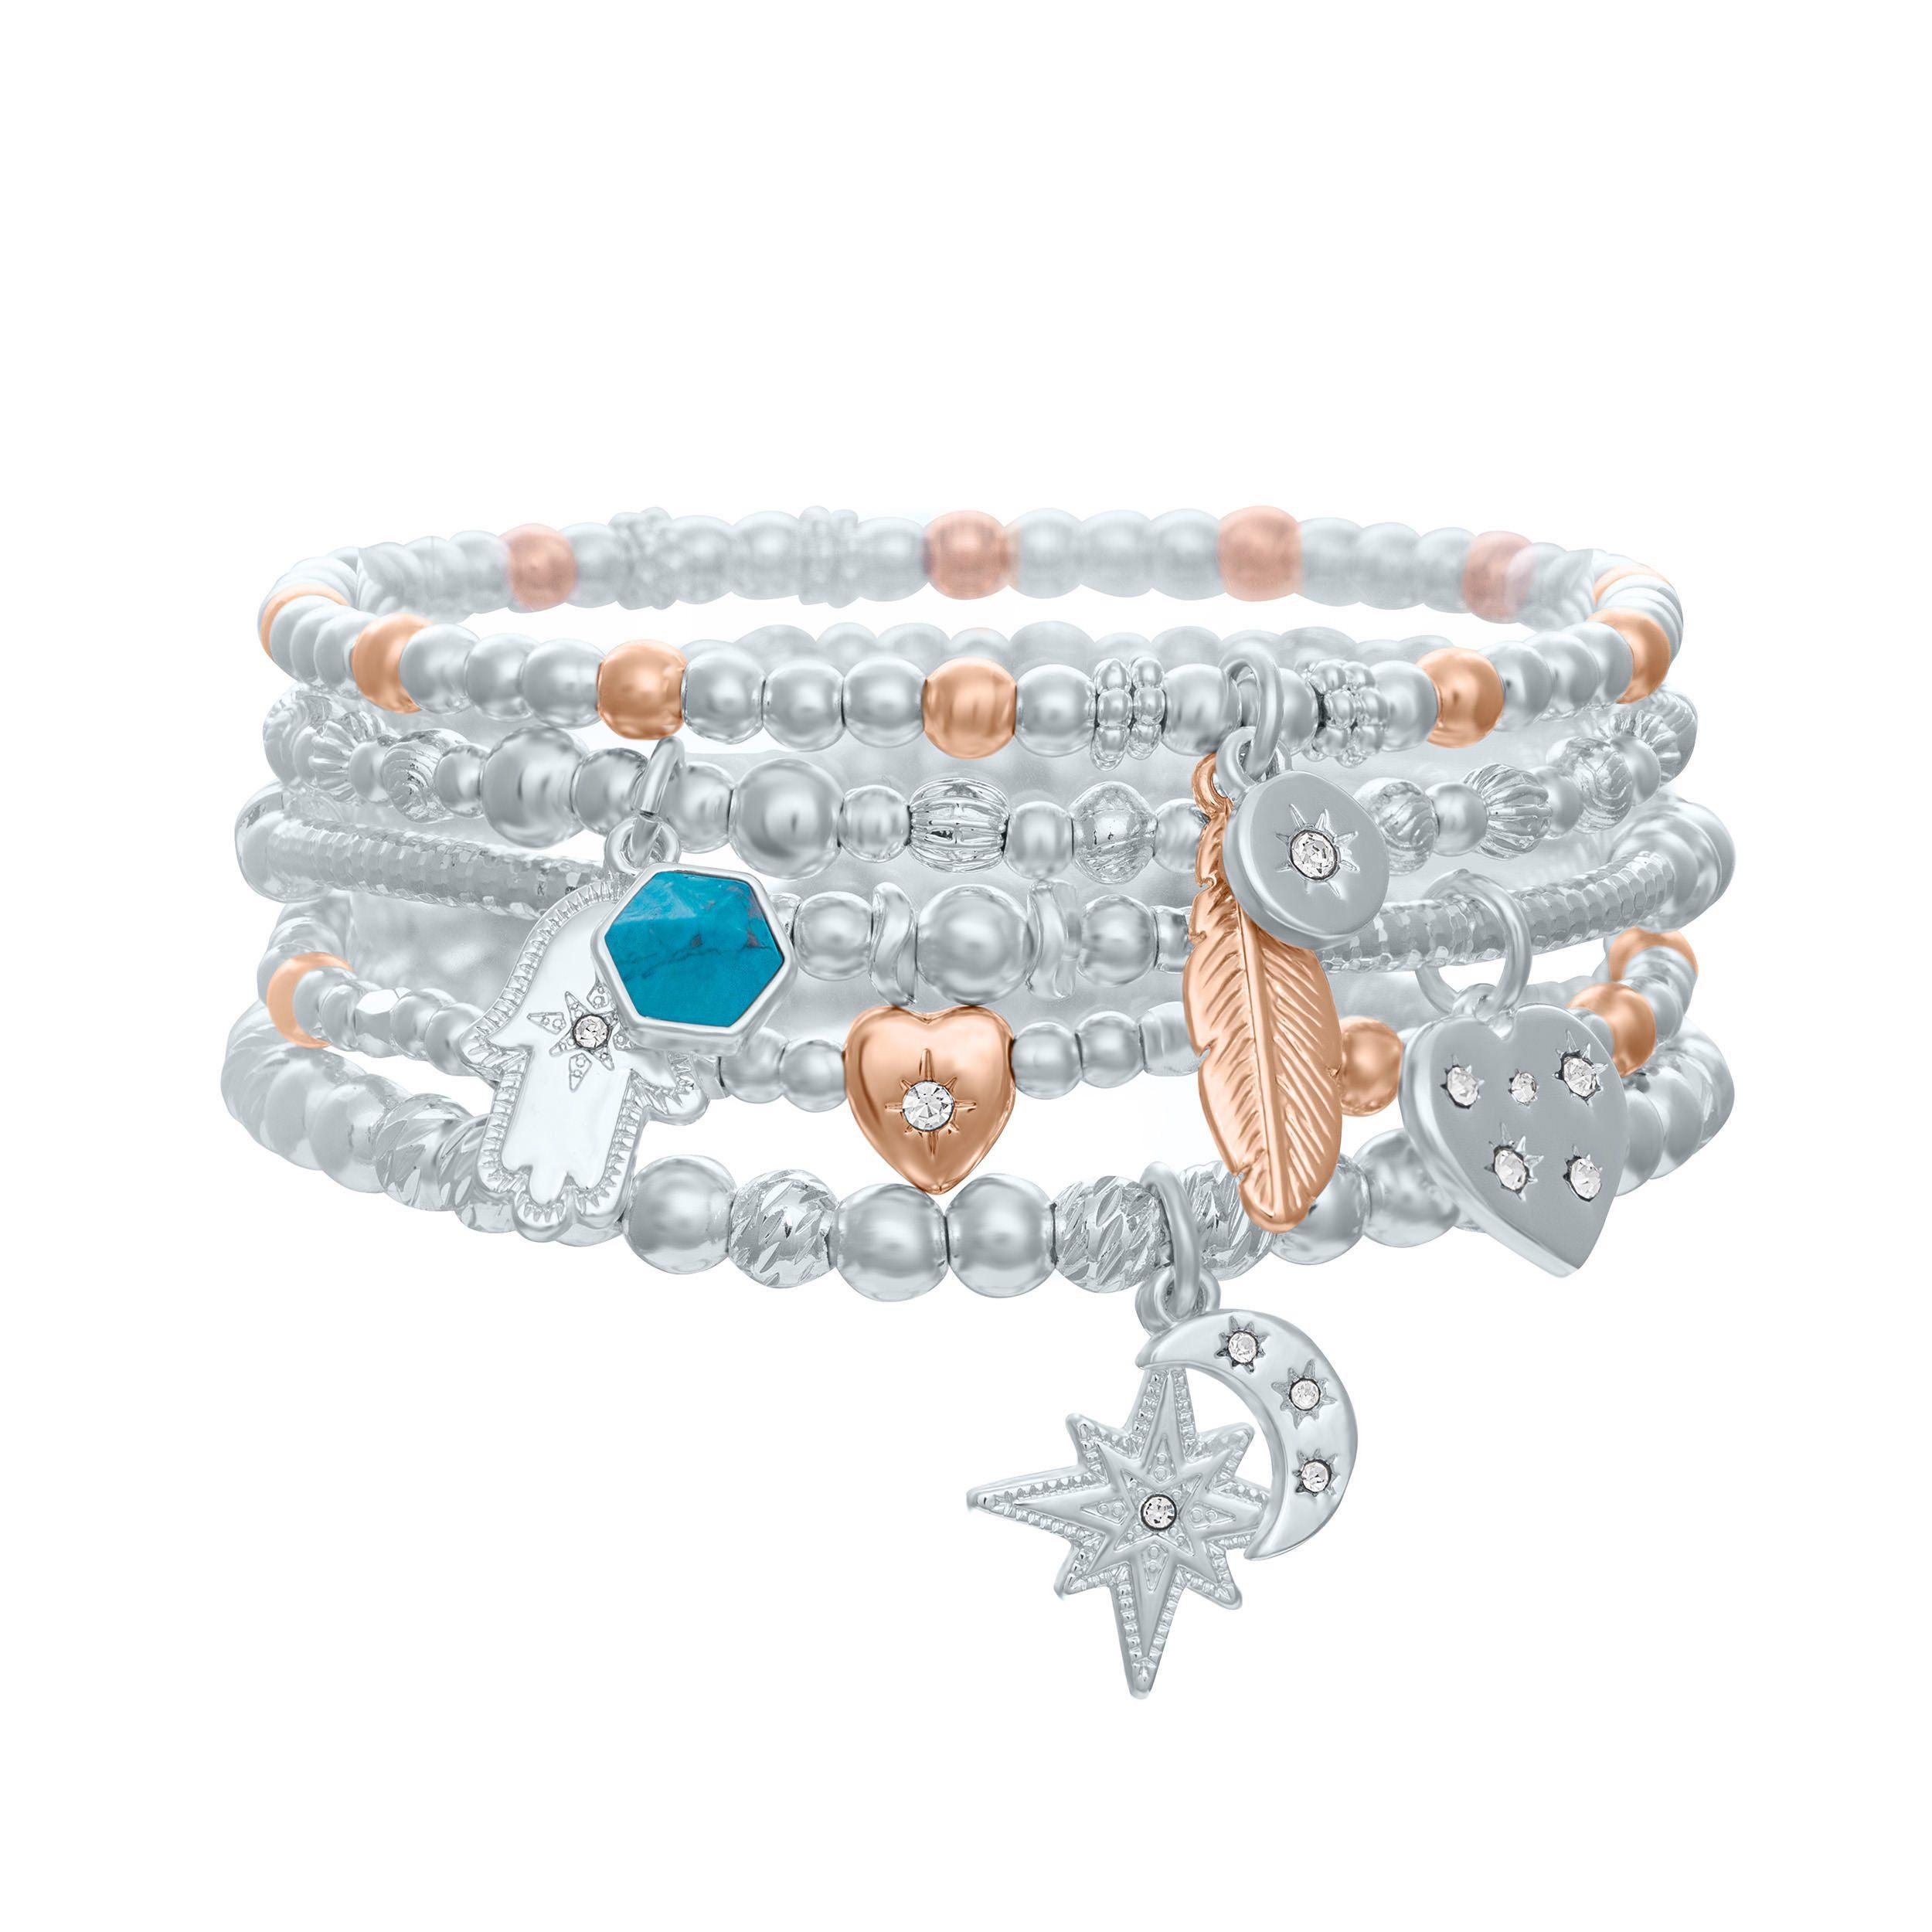 Buckley London Hamsa Hand Wish Bracelet